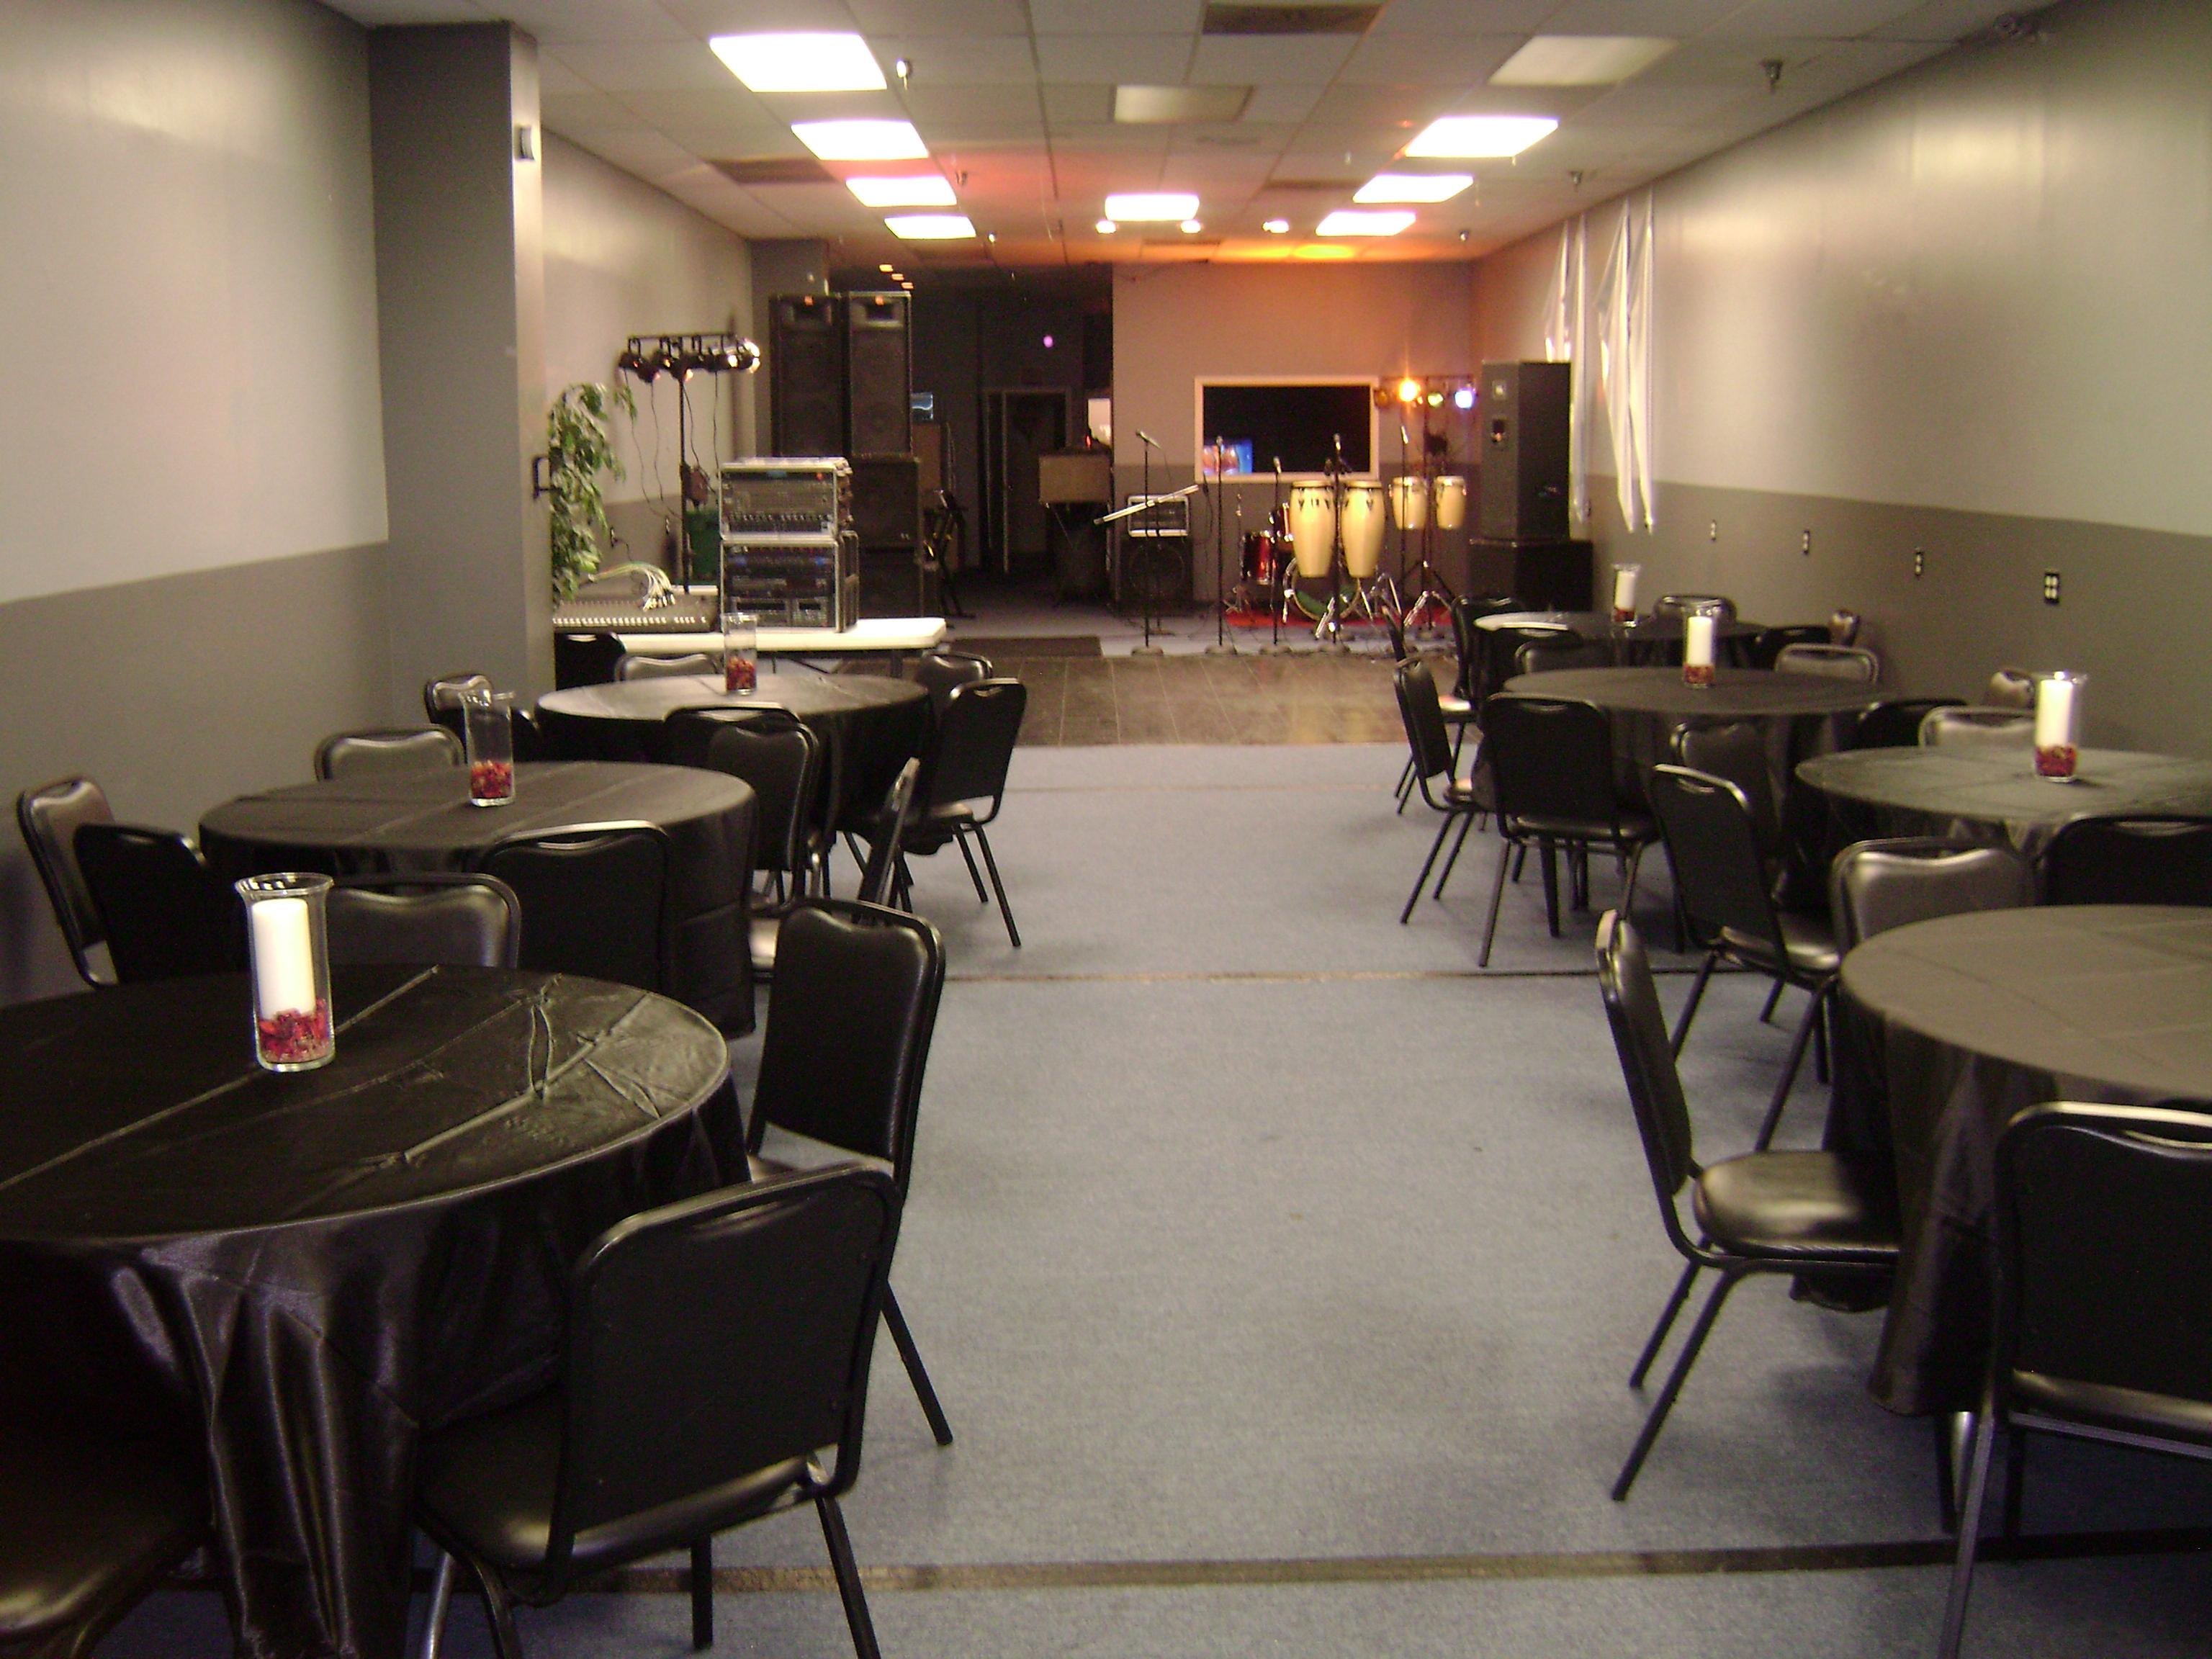 Uniqek Banquet Hall 3130 Branch Ave Temple Hills Md